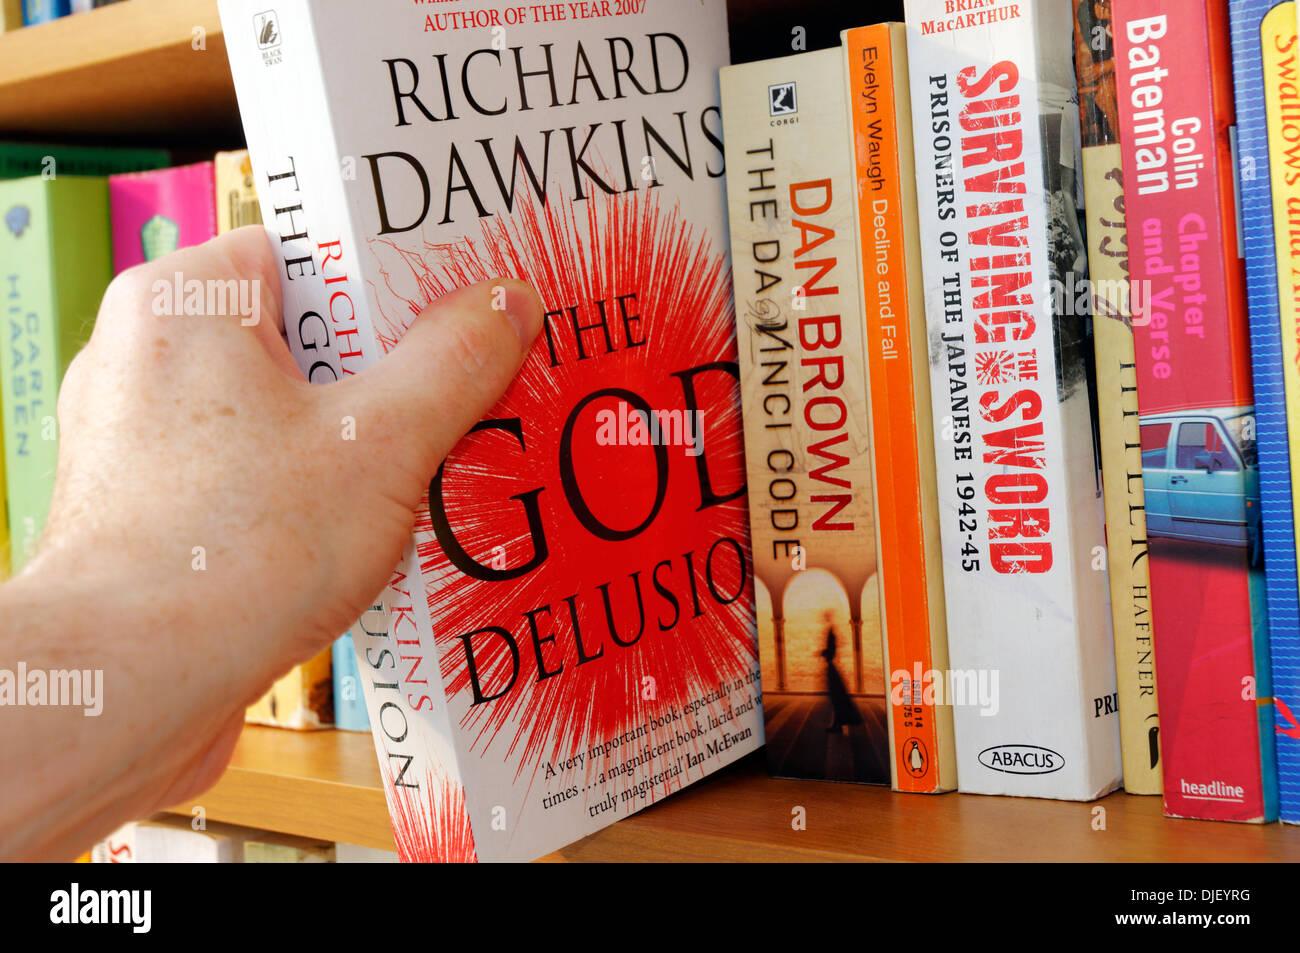 richard dawkins stock photos